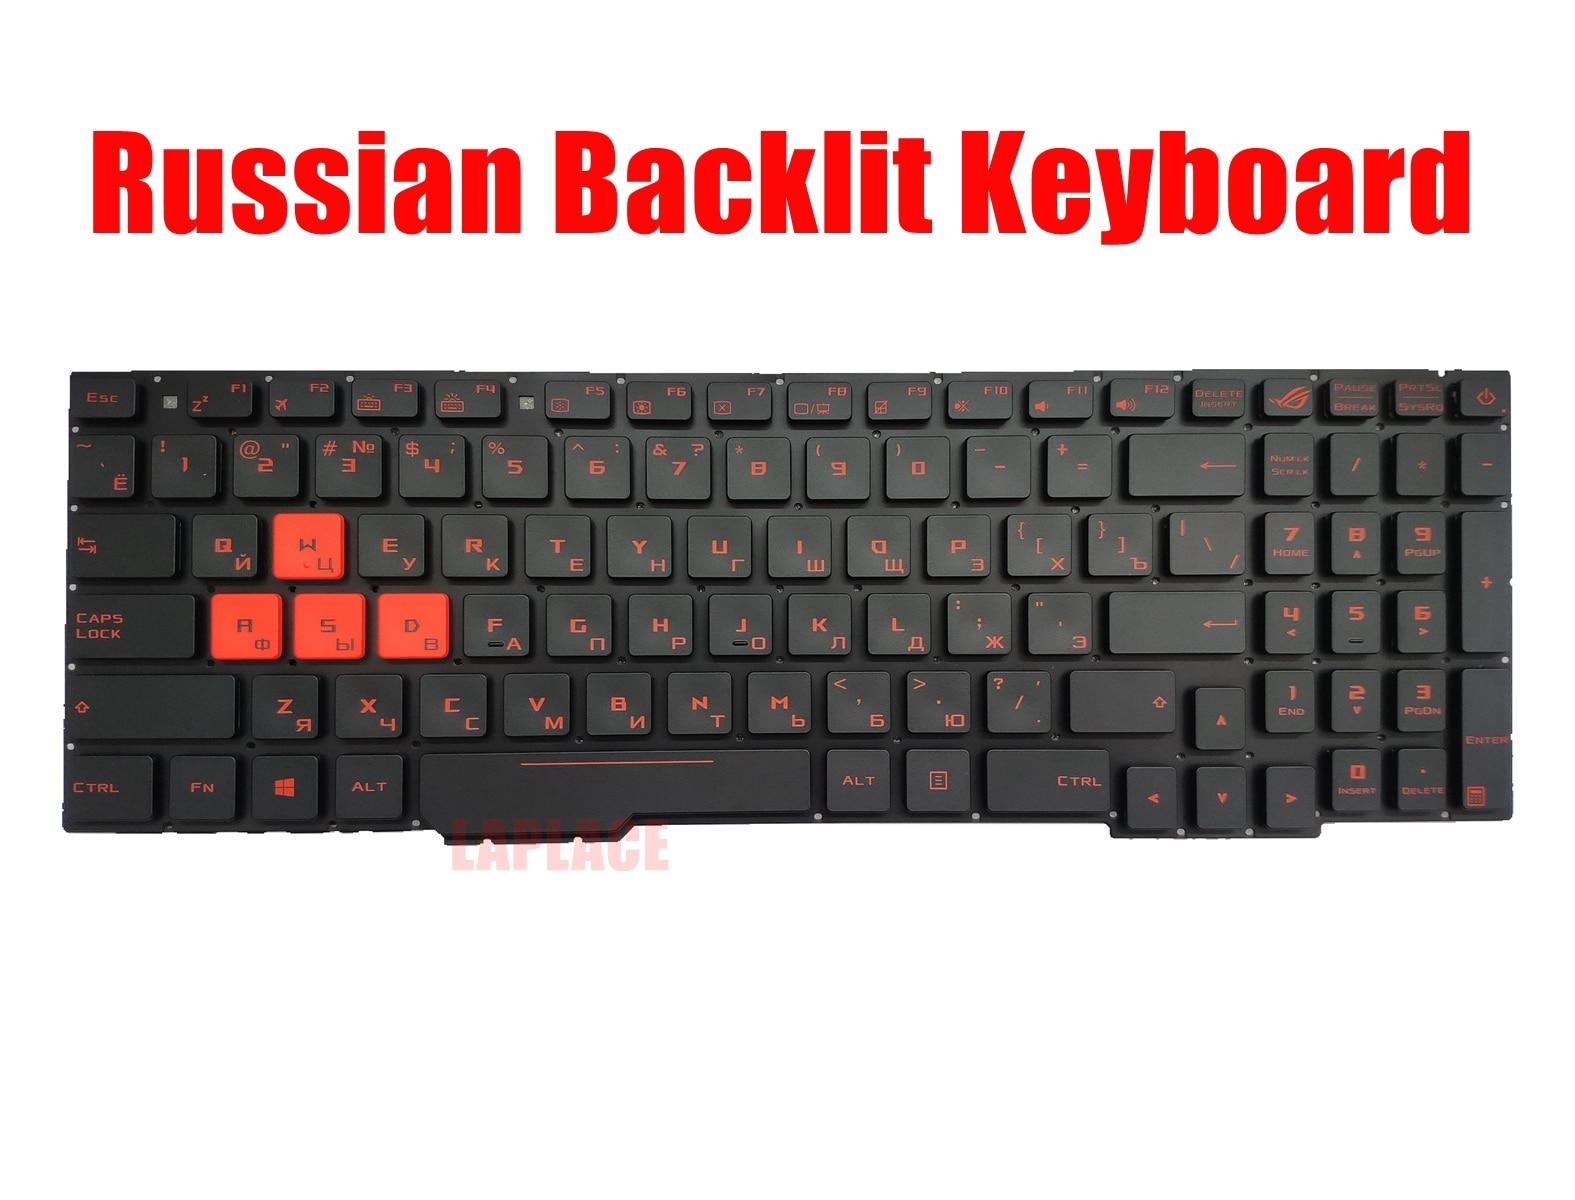 GAOCHENG Laptop Keyboard for ASUS G55 G55VW Black with Gray Frame with Backlight V132662AK2 SK 0KNB0-B411SK00 0KN0-MK1SK21 Slovakian SK